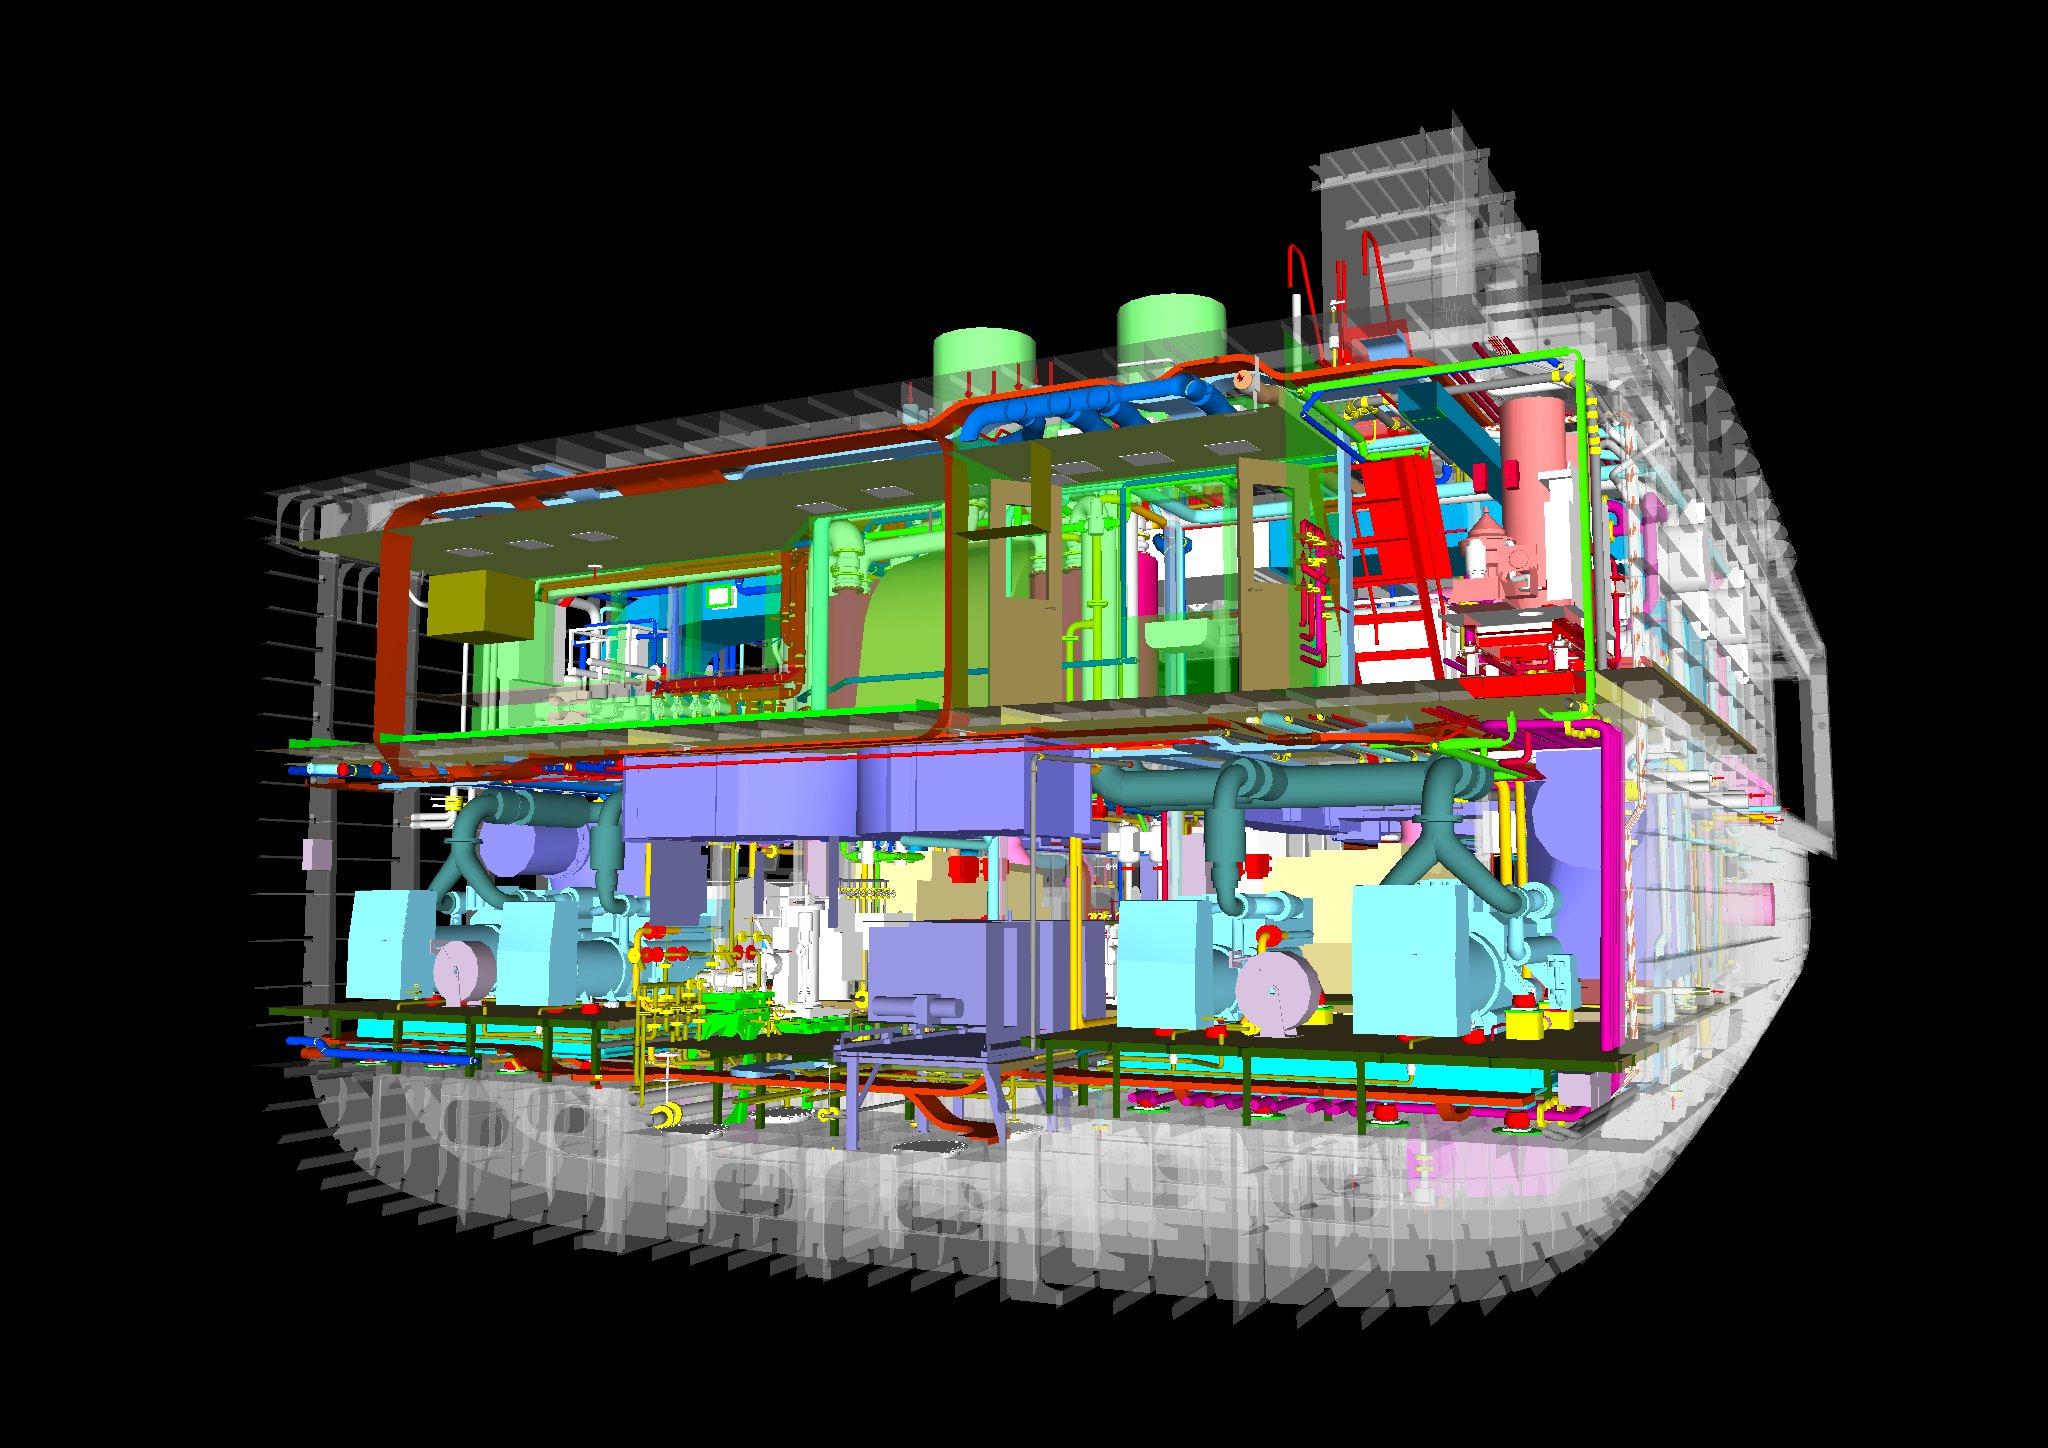 Boat design engineer   Whirligigs row